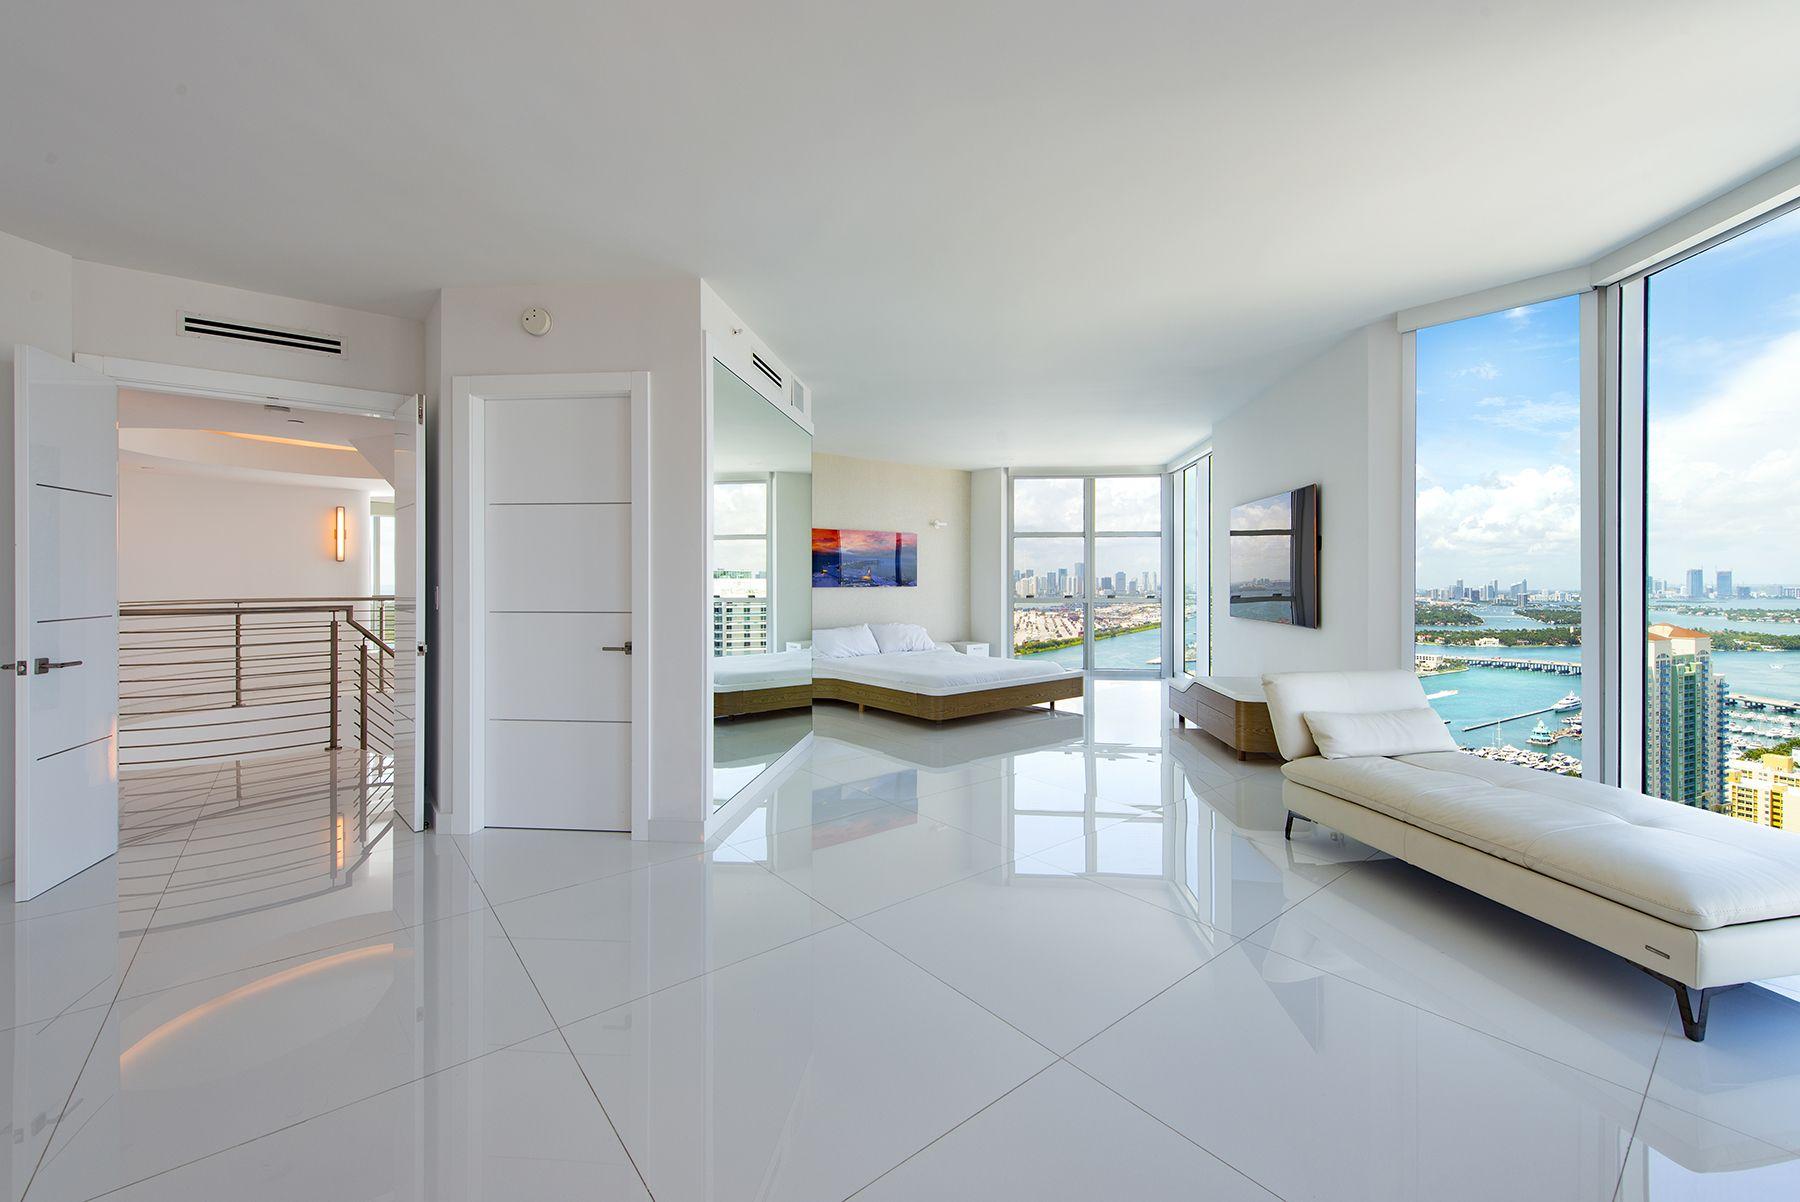 Portofino_Tower_Penthouse-11.0.jpg